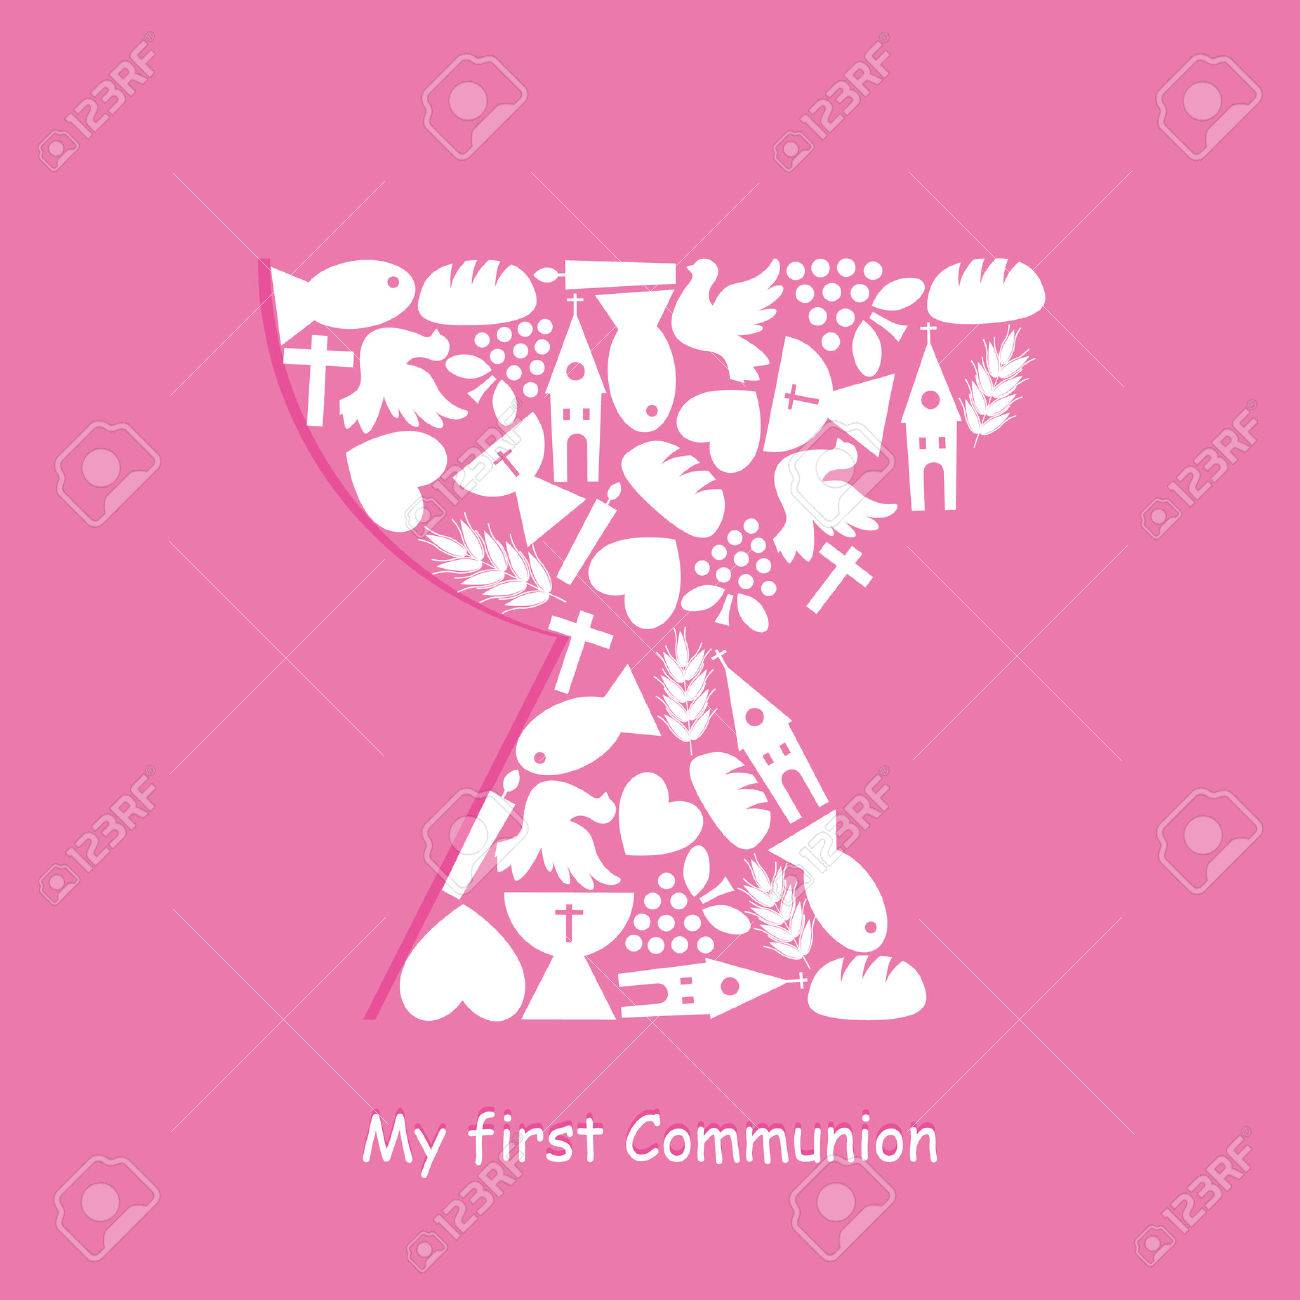 First Communion Invitation Card - 37734383